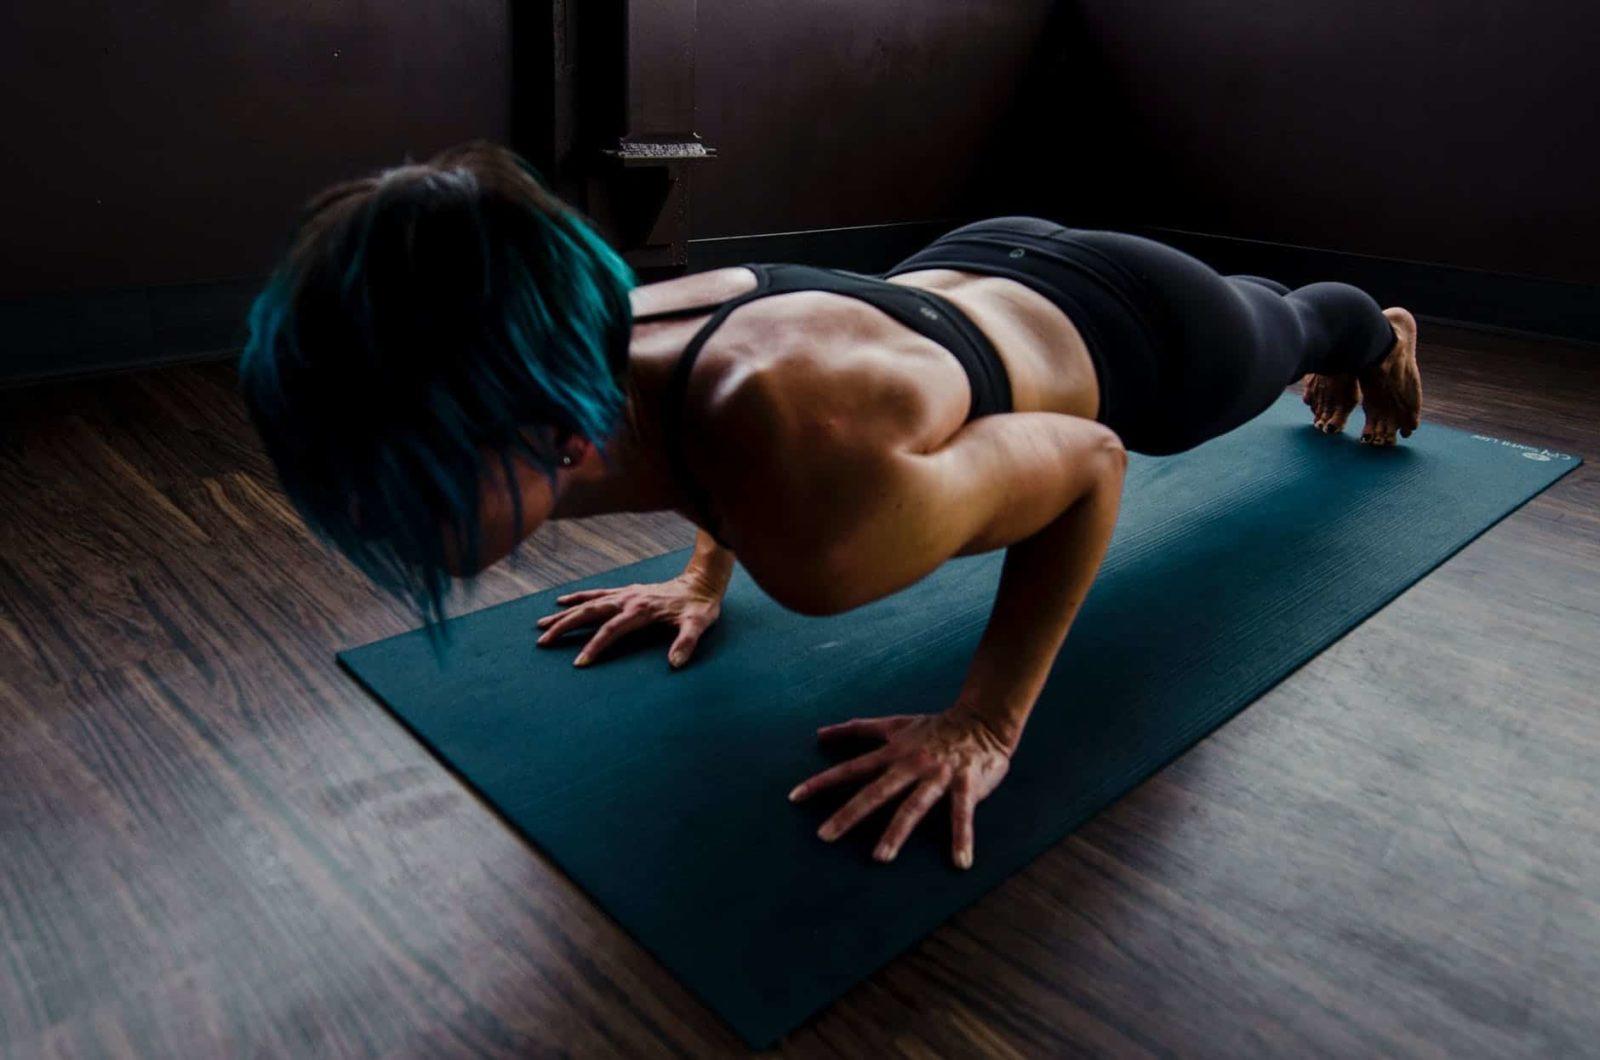 positivity challenge with push-ups